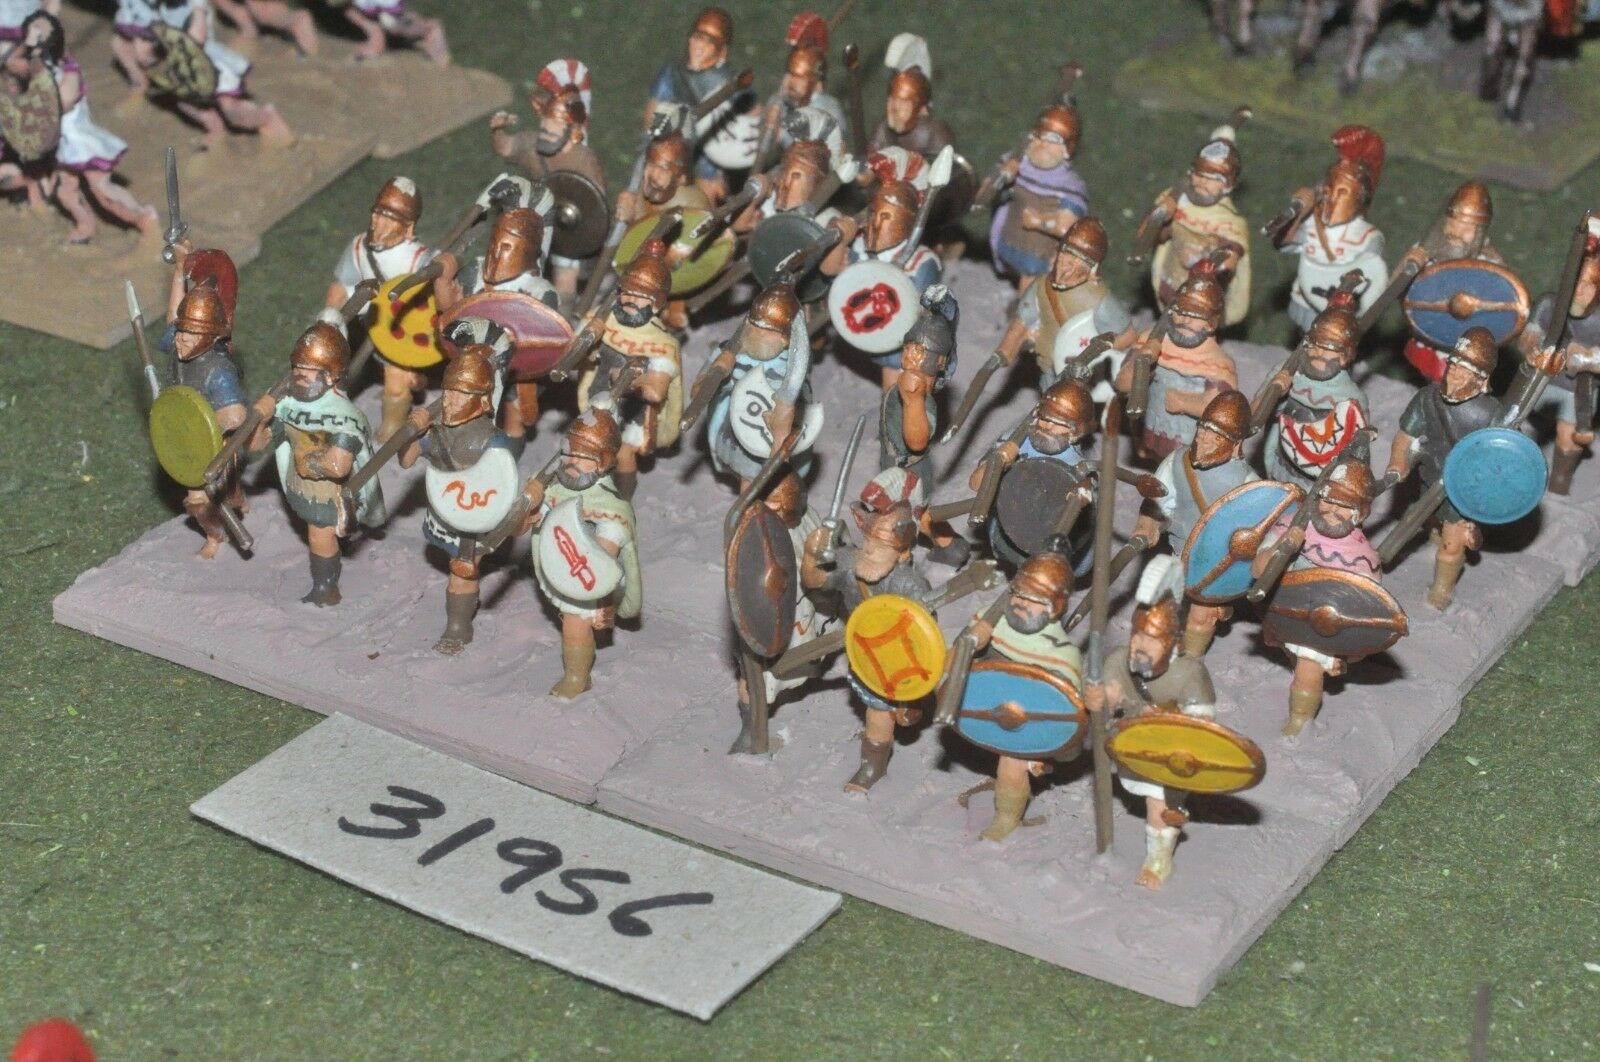 25mm griego clásico-peltasts 32 figuras-INF (31956)